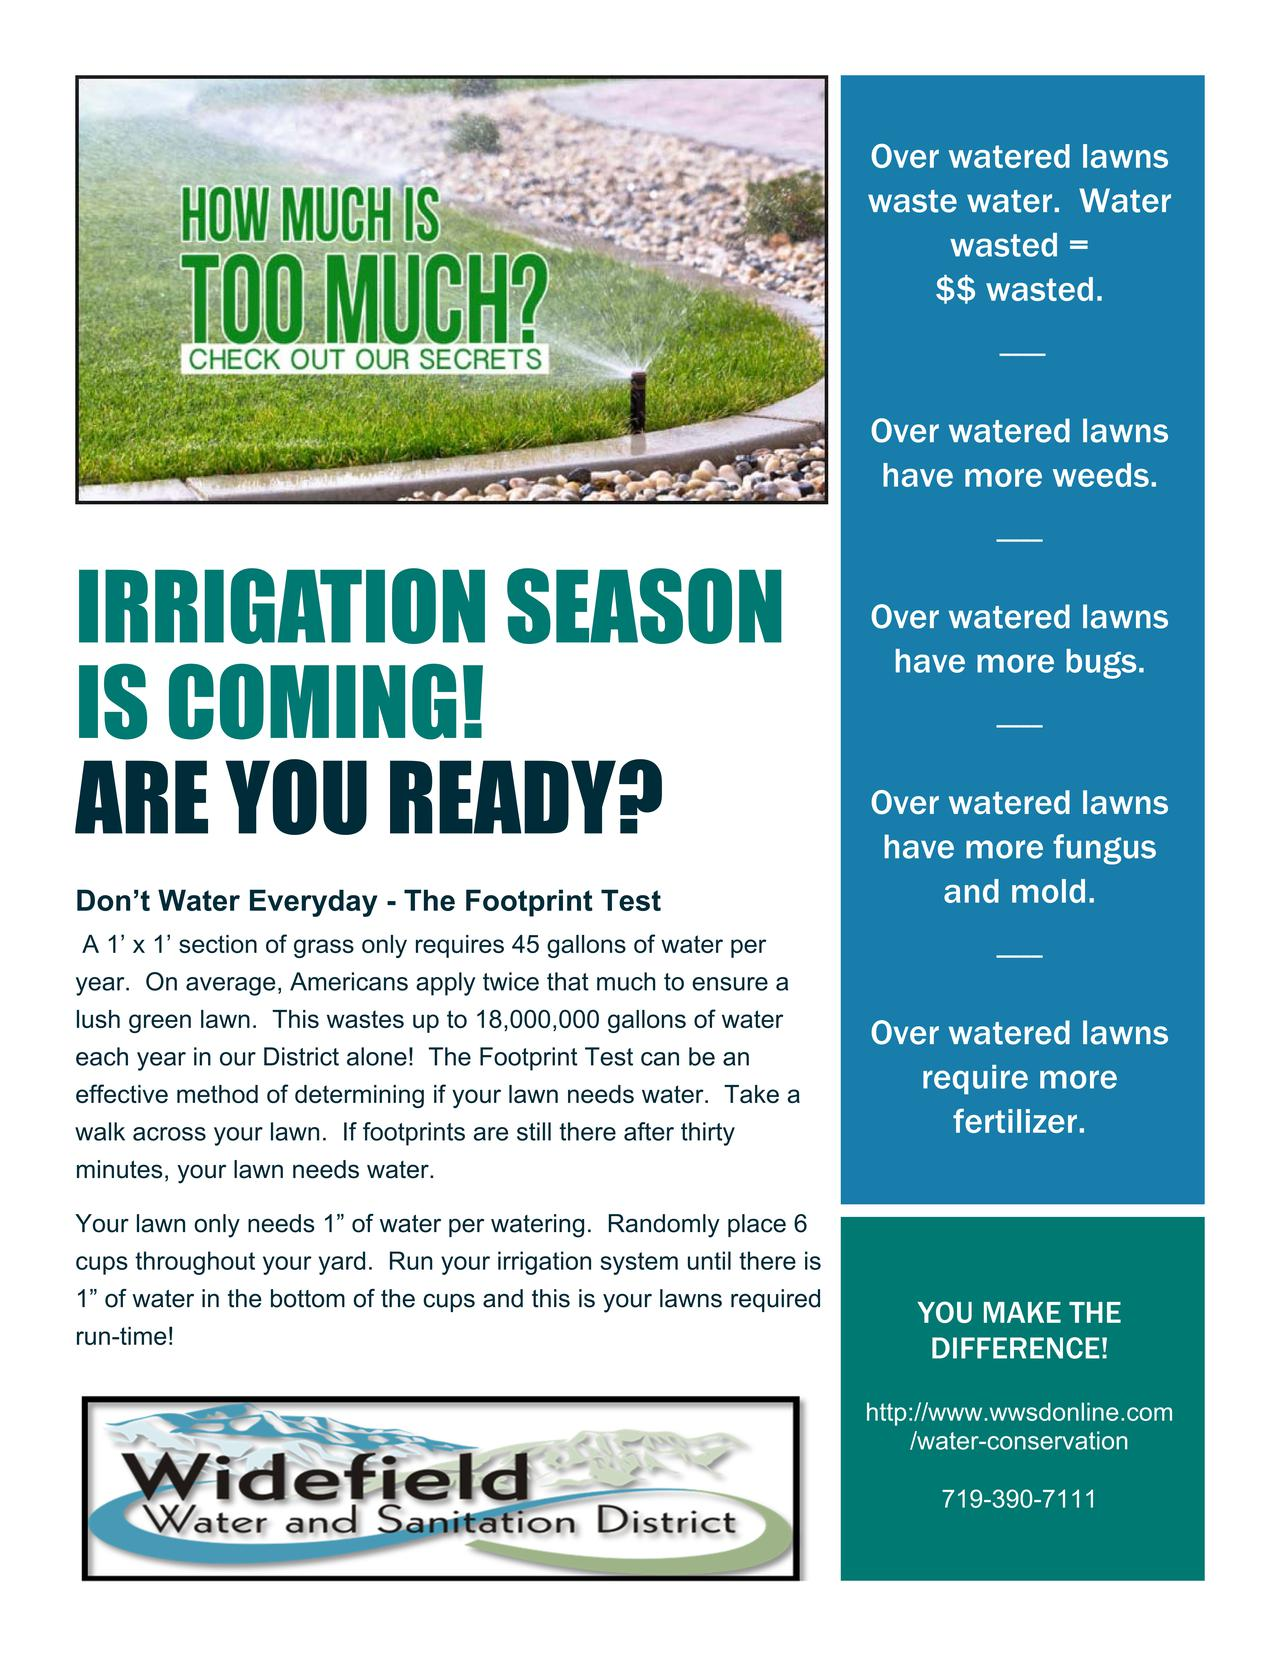 IrrigationSeason_001.jpg